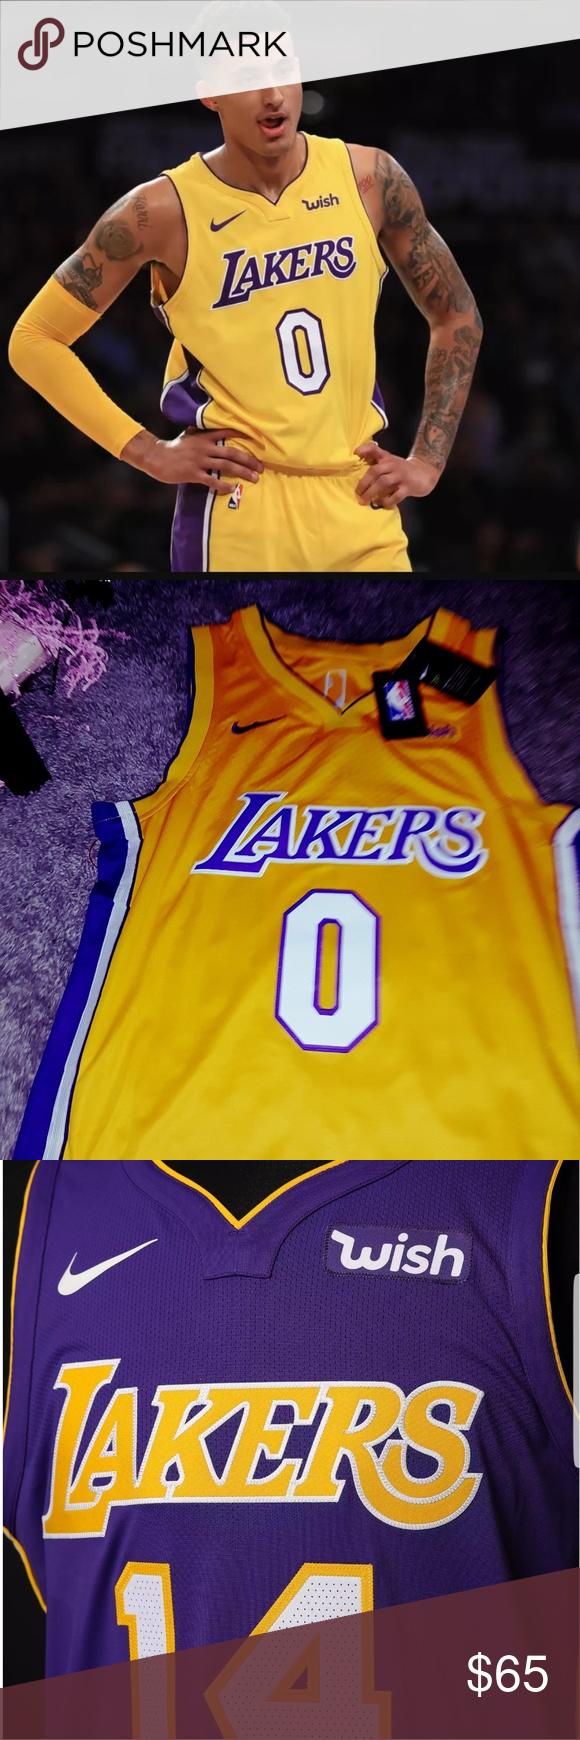 san francisco aeb35 46f43 Lakers Kuzma Nike wish Jersey Nike wish Jersey Los Angeles ...